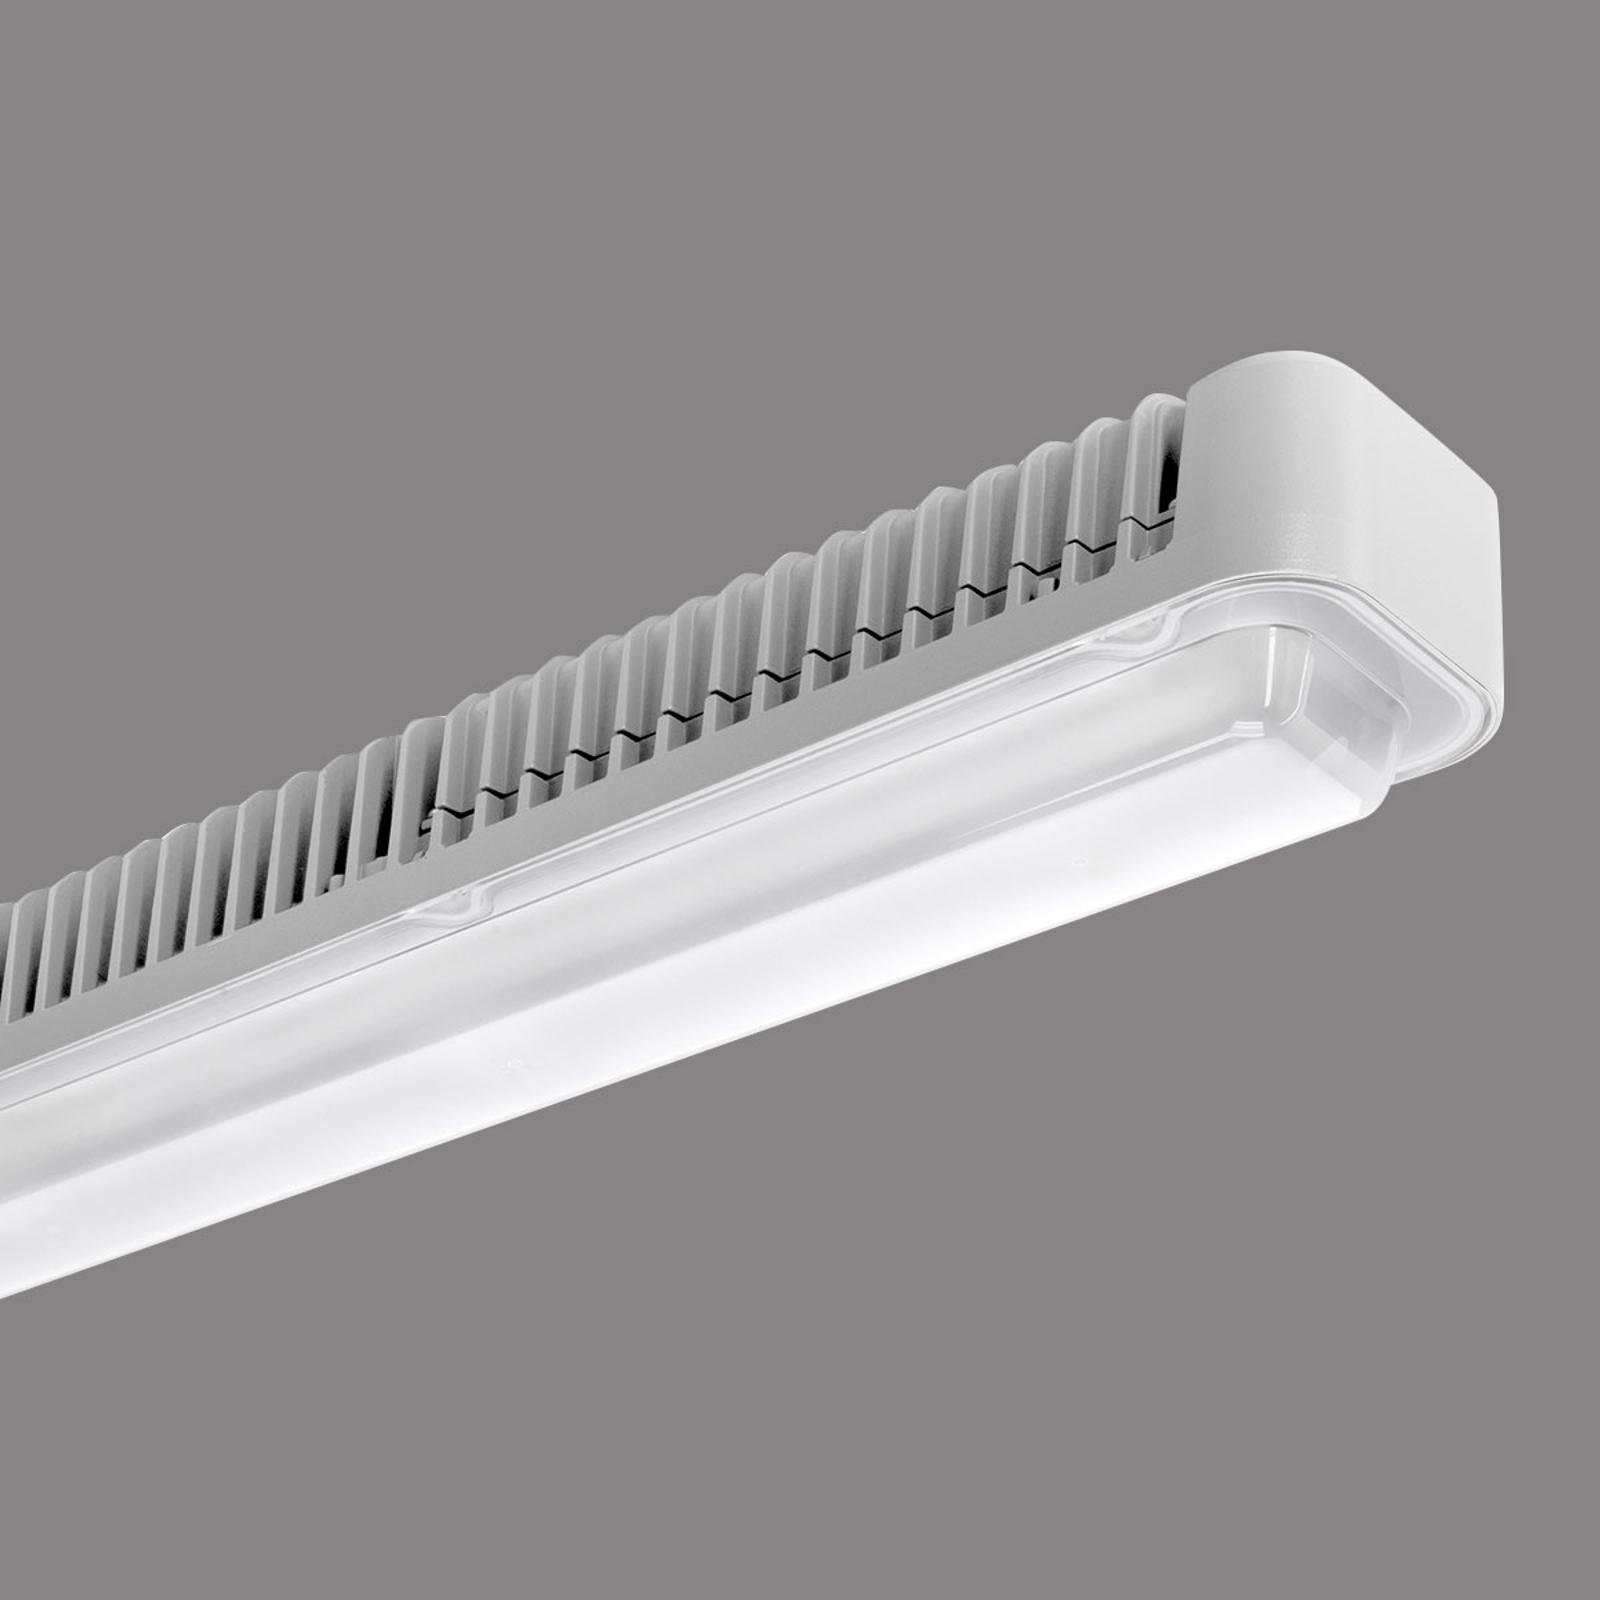 LED plafondlamp Koa Line STR/PC S/EW 112W